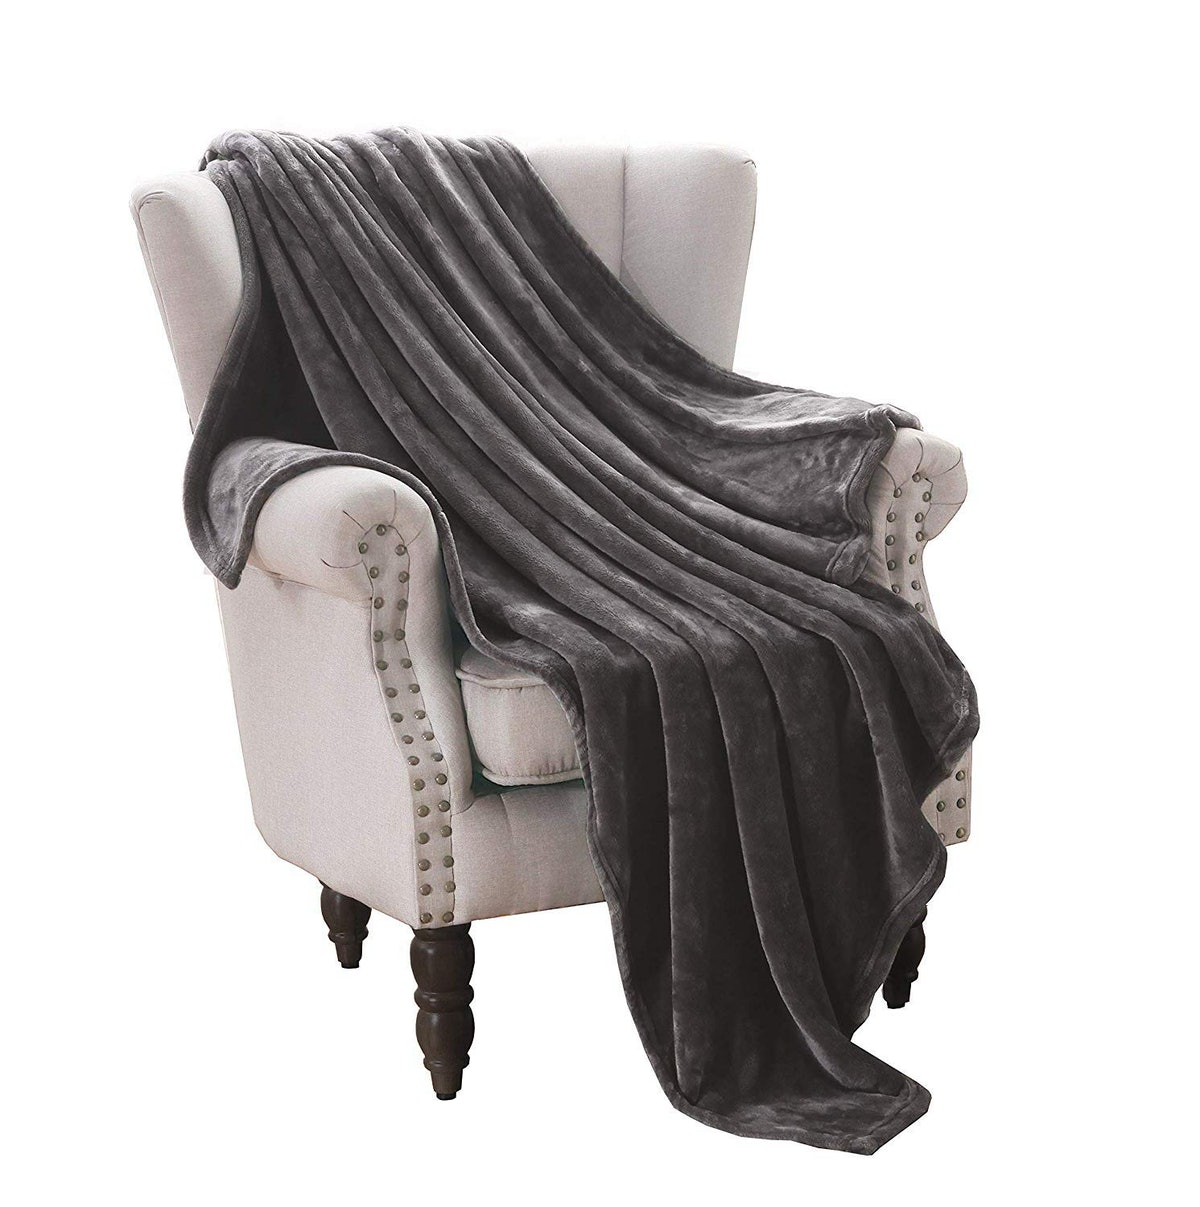 Exclusivo Mezcla Velvet Throw Blanket